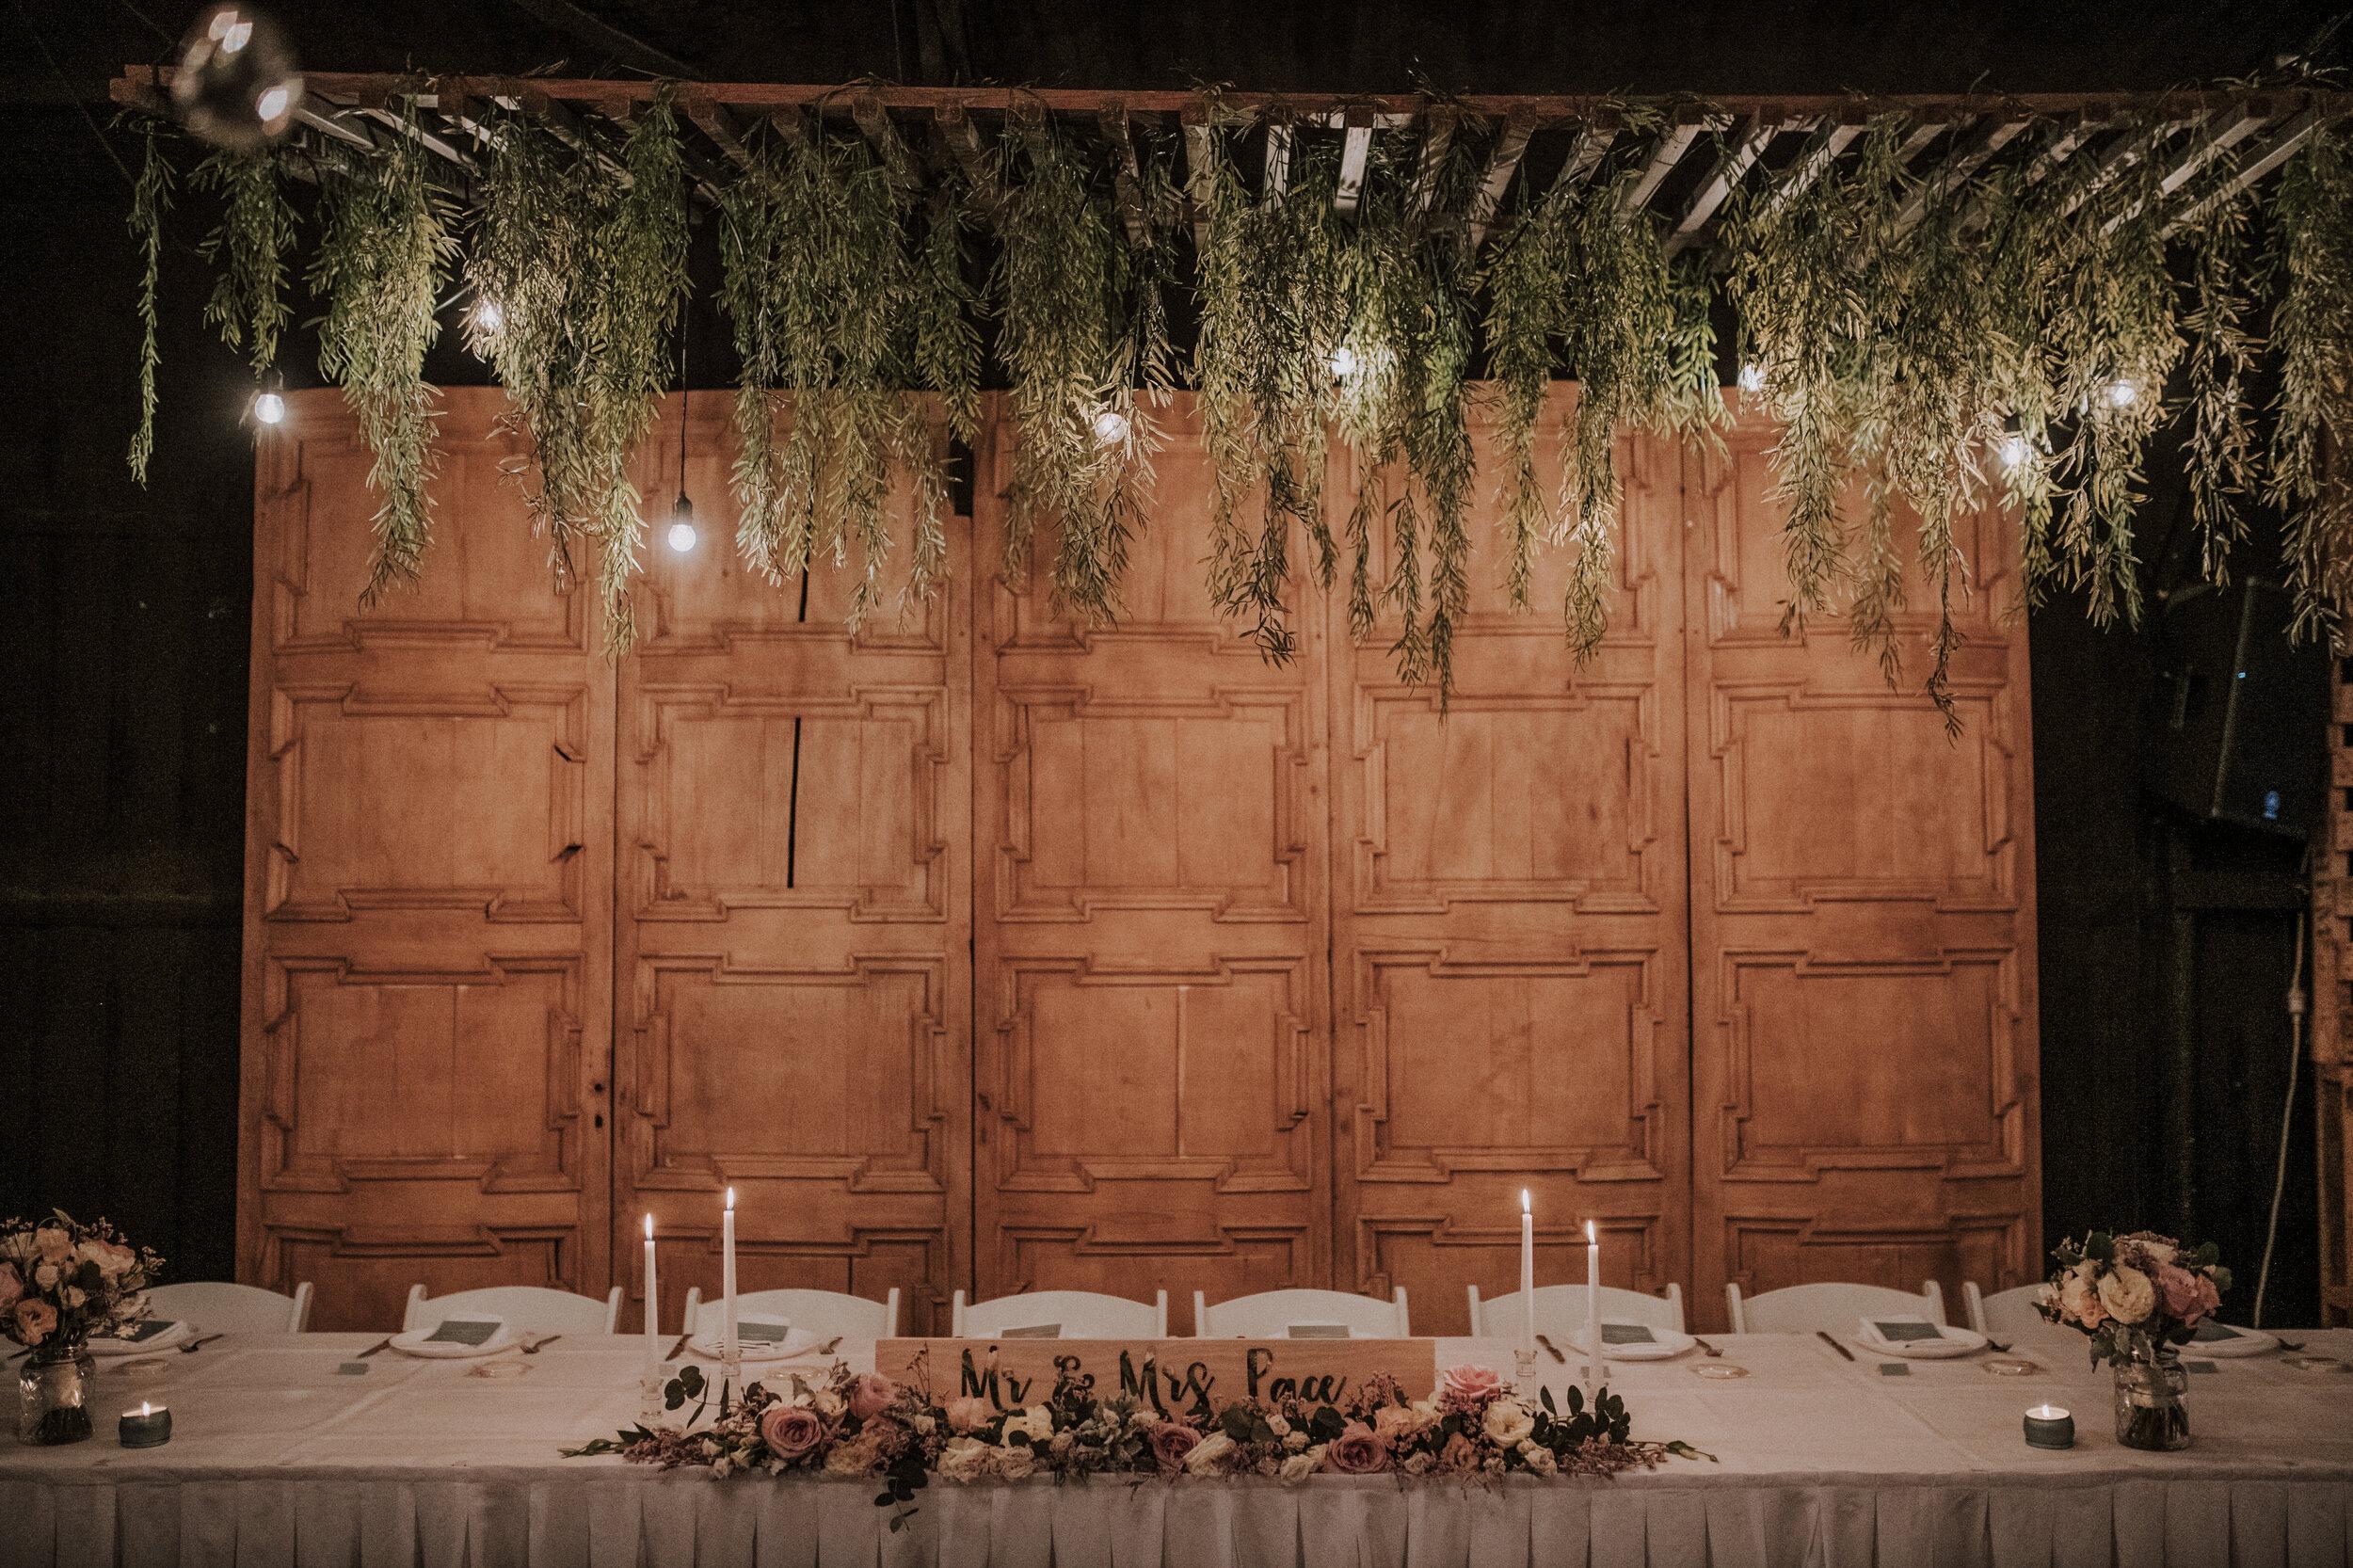 Jemma + Daniel's Bridal Table